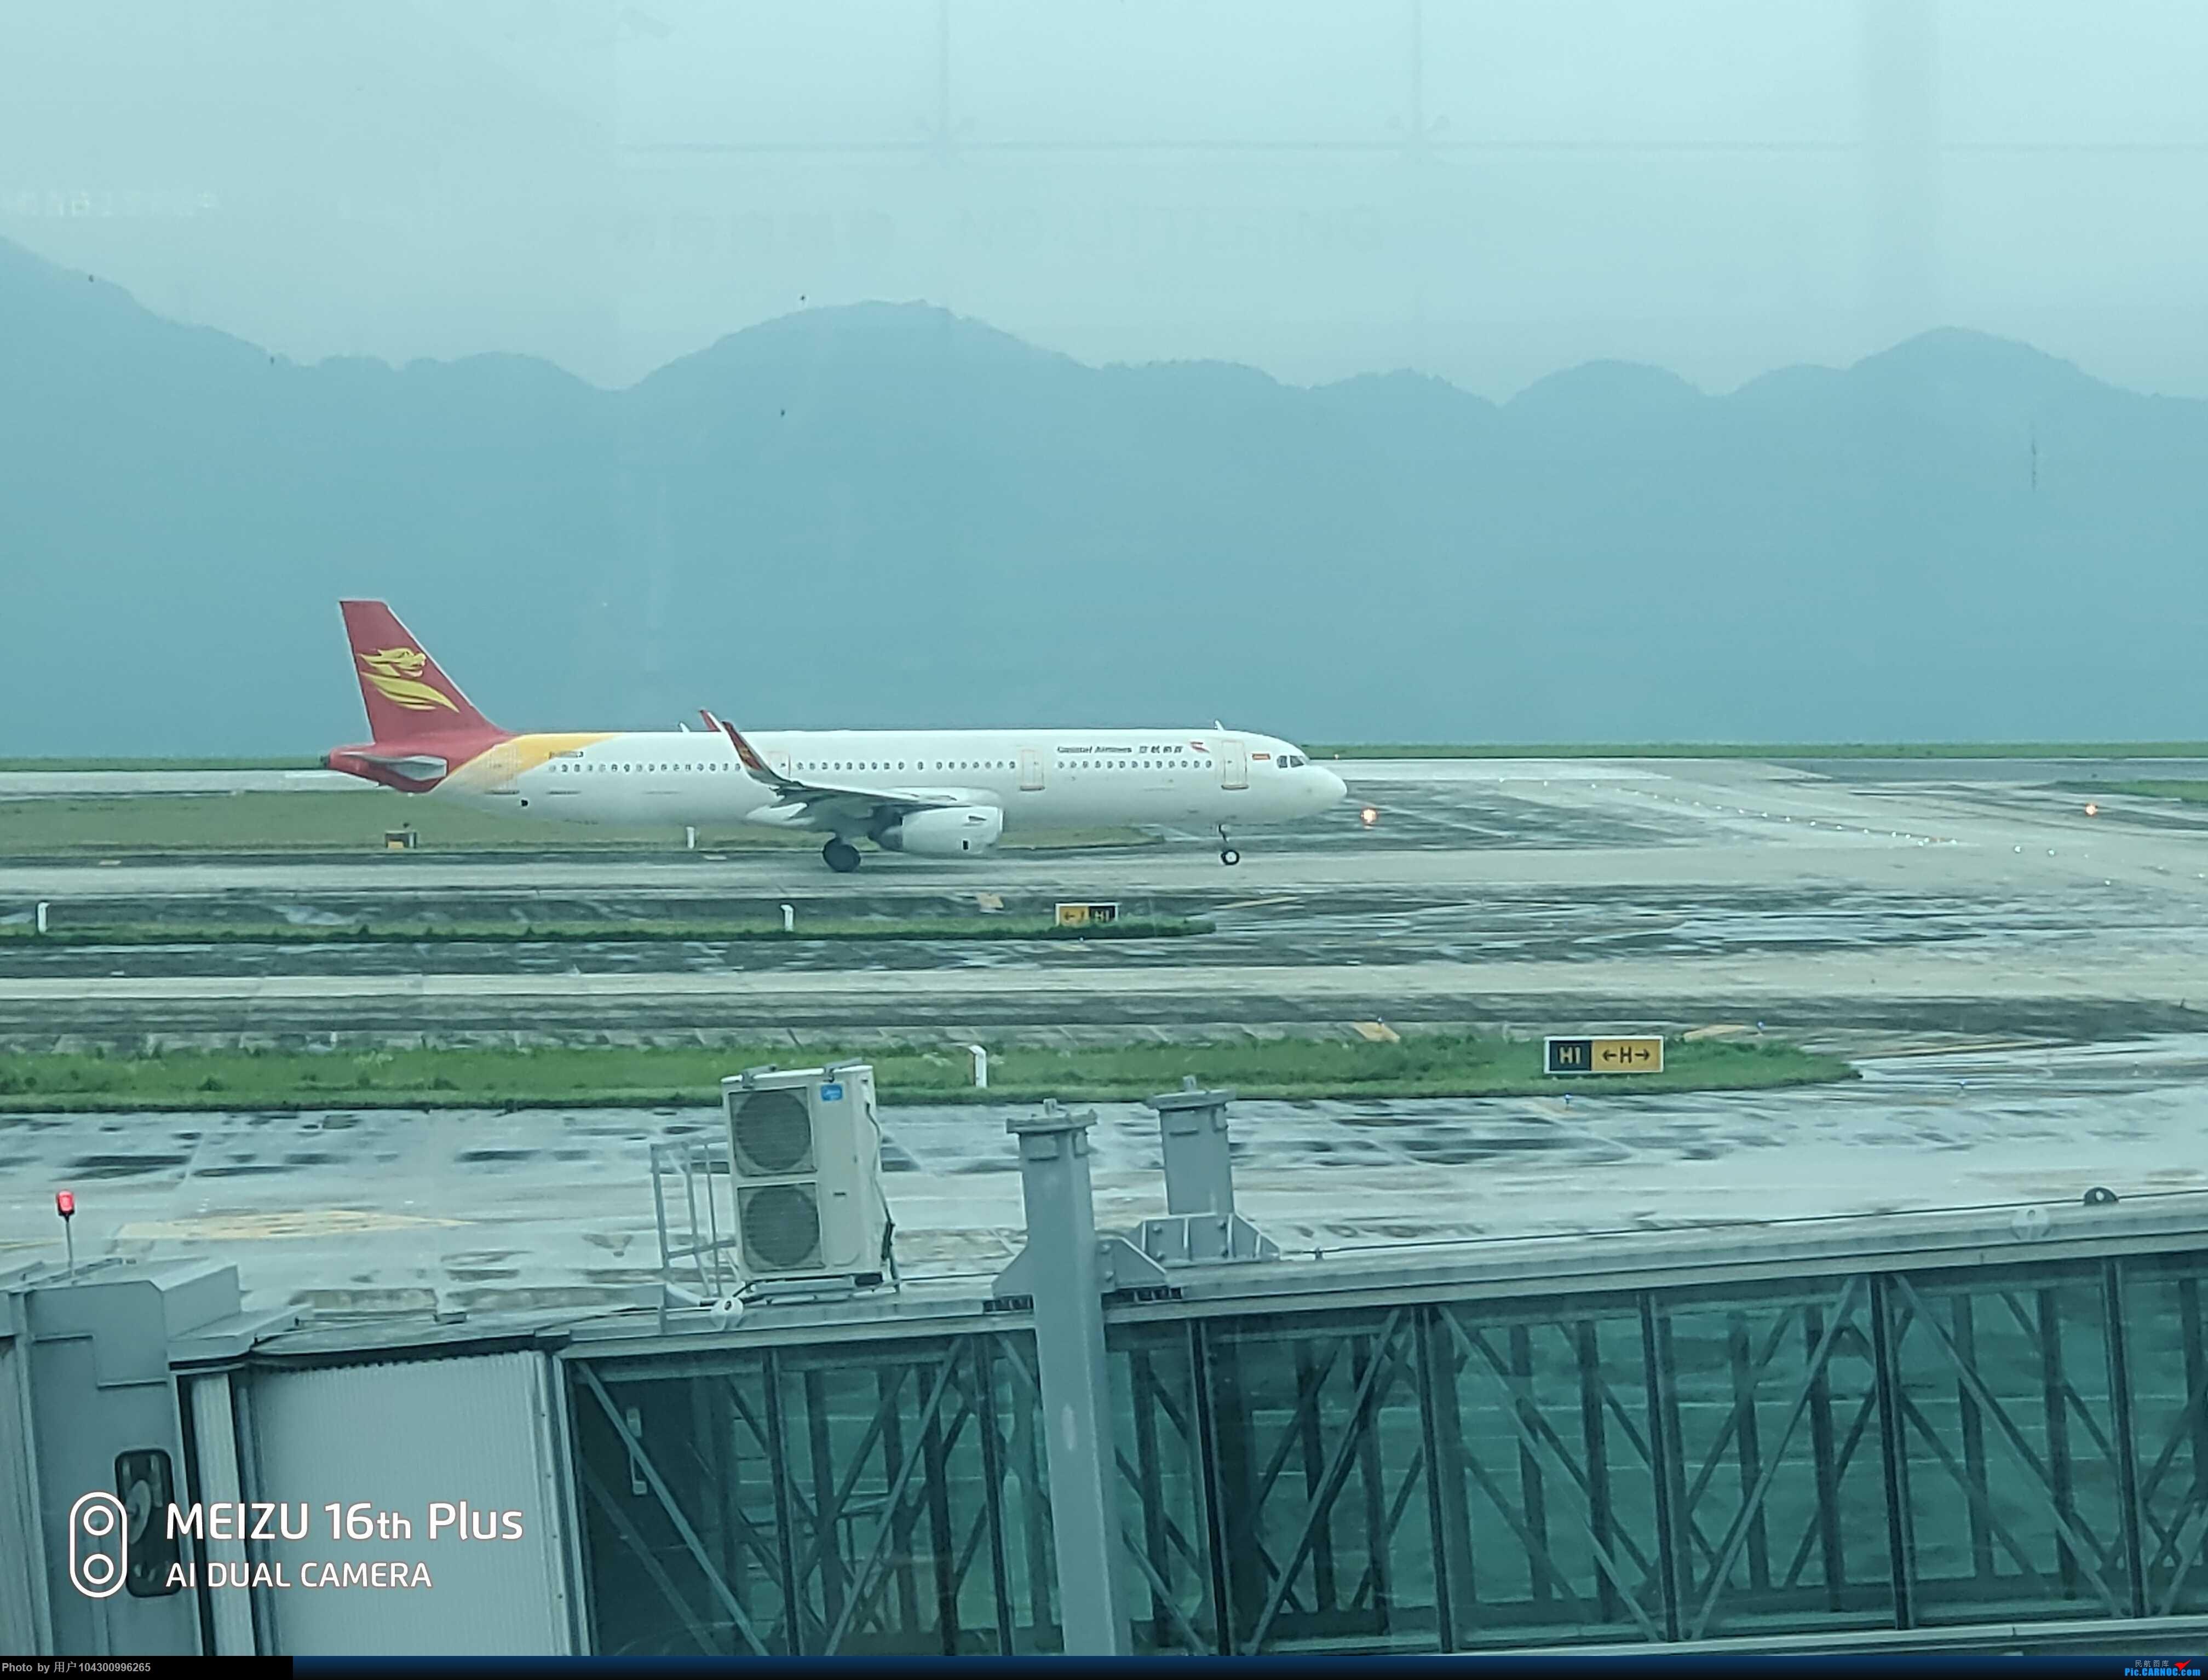 Re:[原创]〖DM哥游记〗多彩贵州航空~重庆--贵阳 AIRBUS A321-200 B-8553 中国重庆江北国际机场